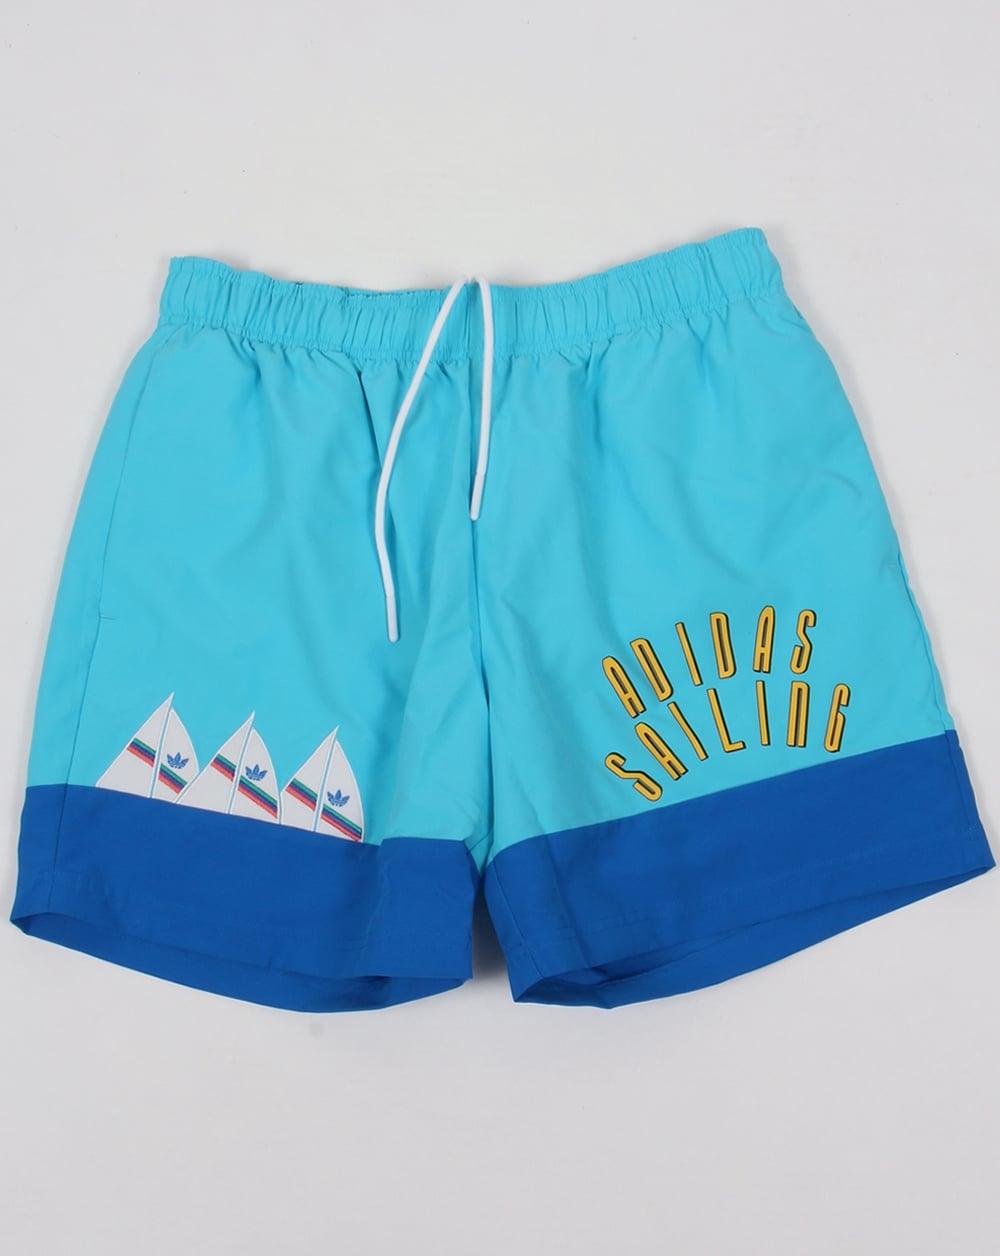 06ecf38233 Adidas Originals Sailing Shorts Blue,swim,beach,mens,swimmers